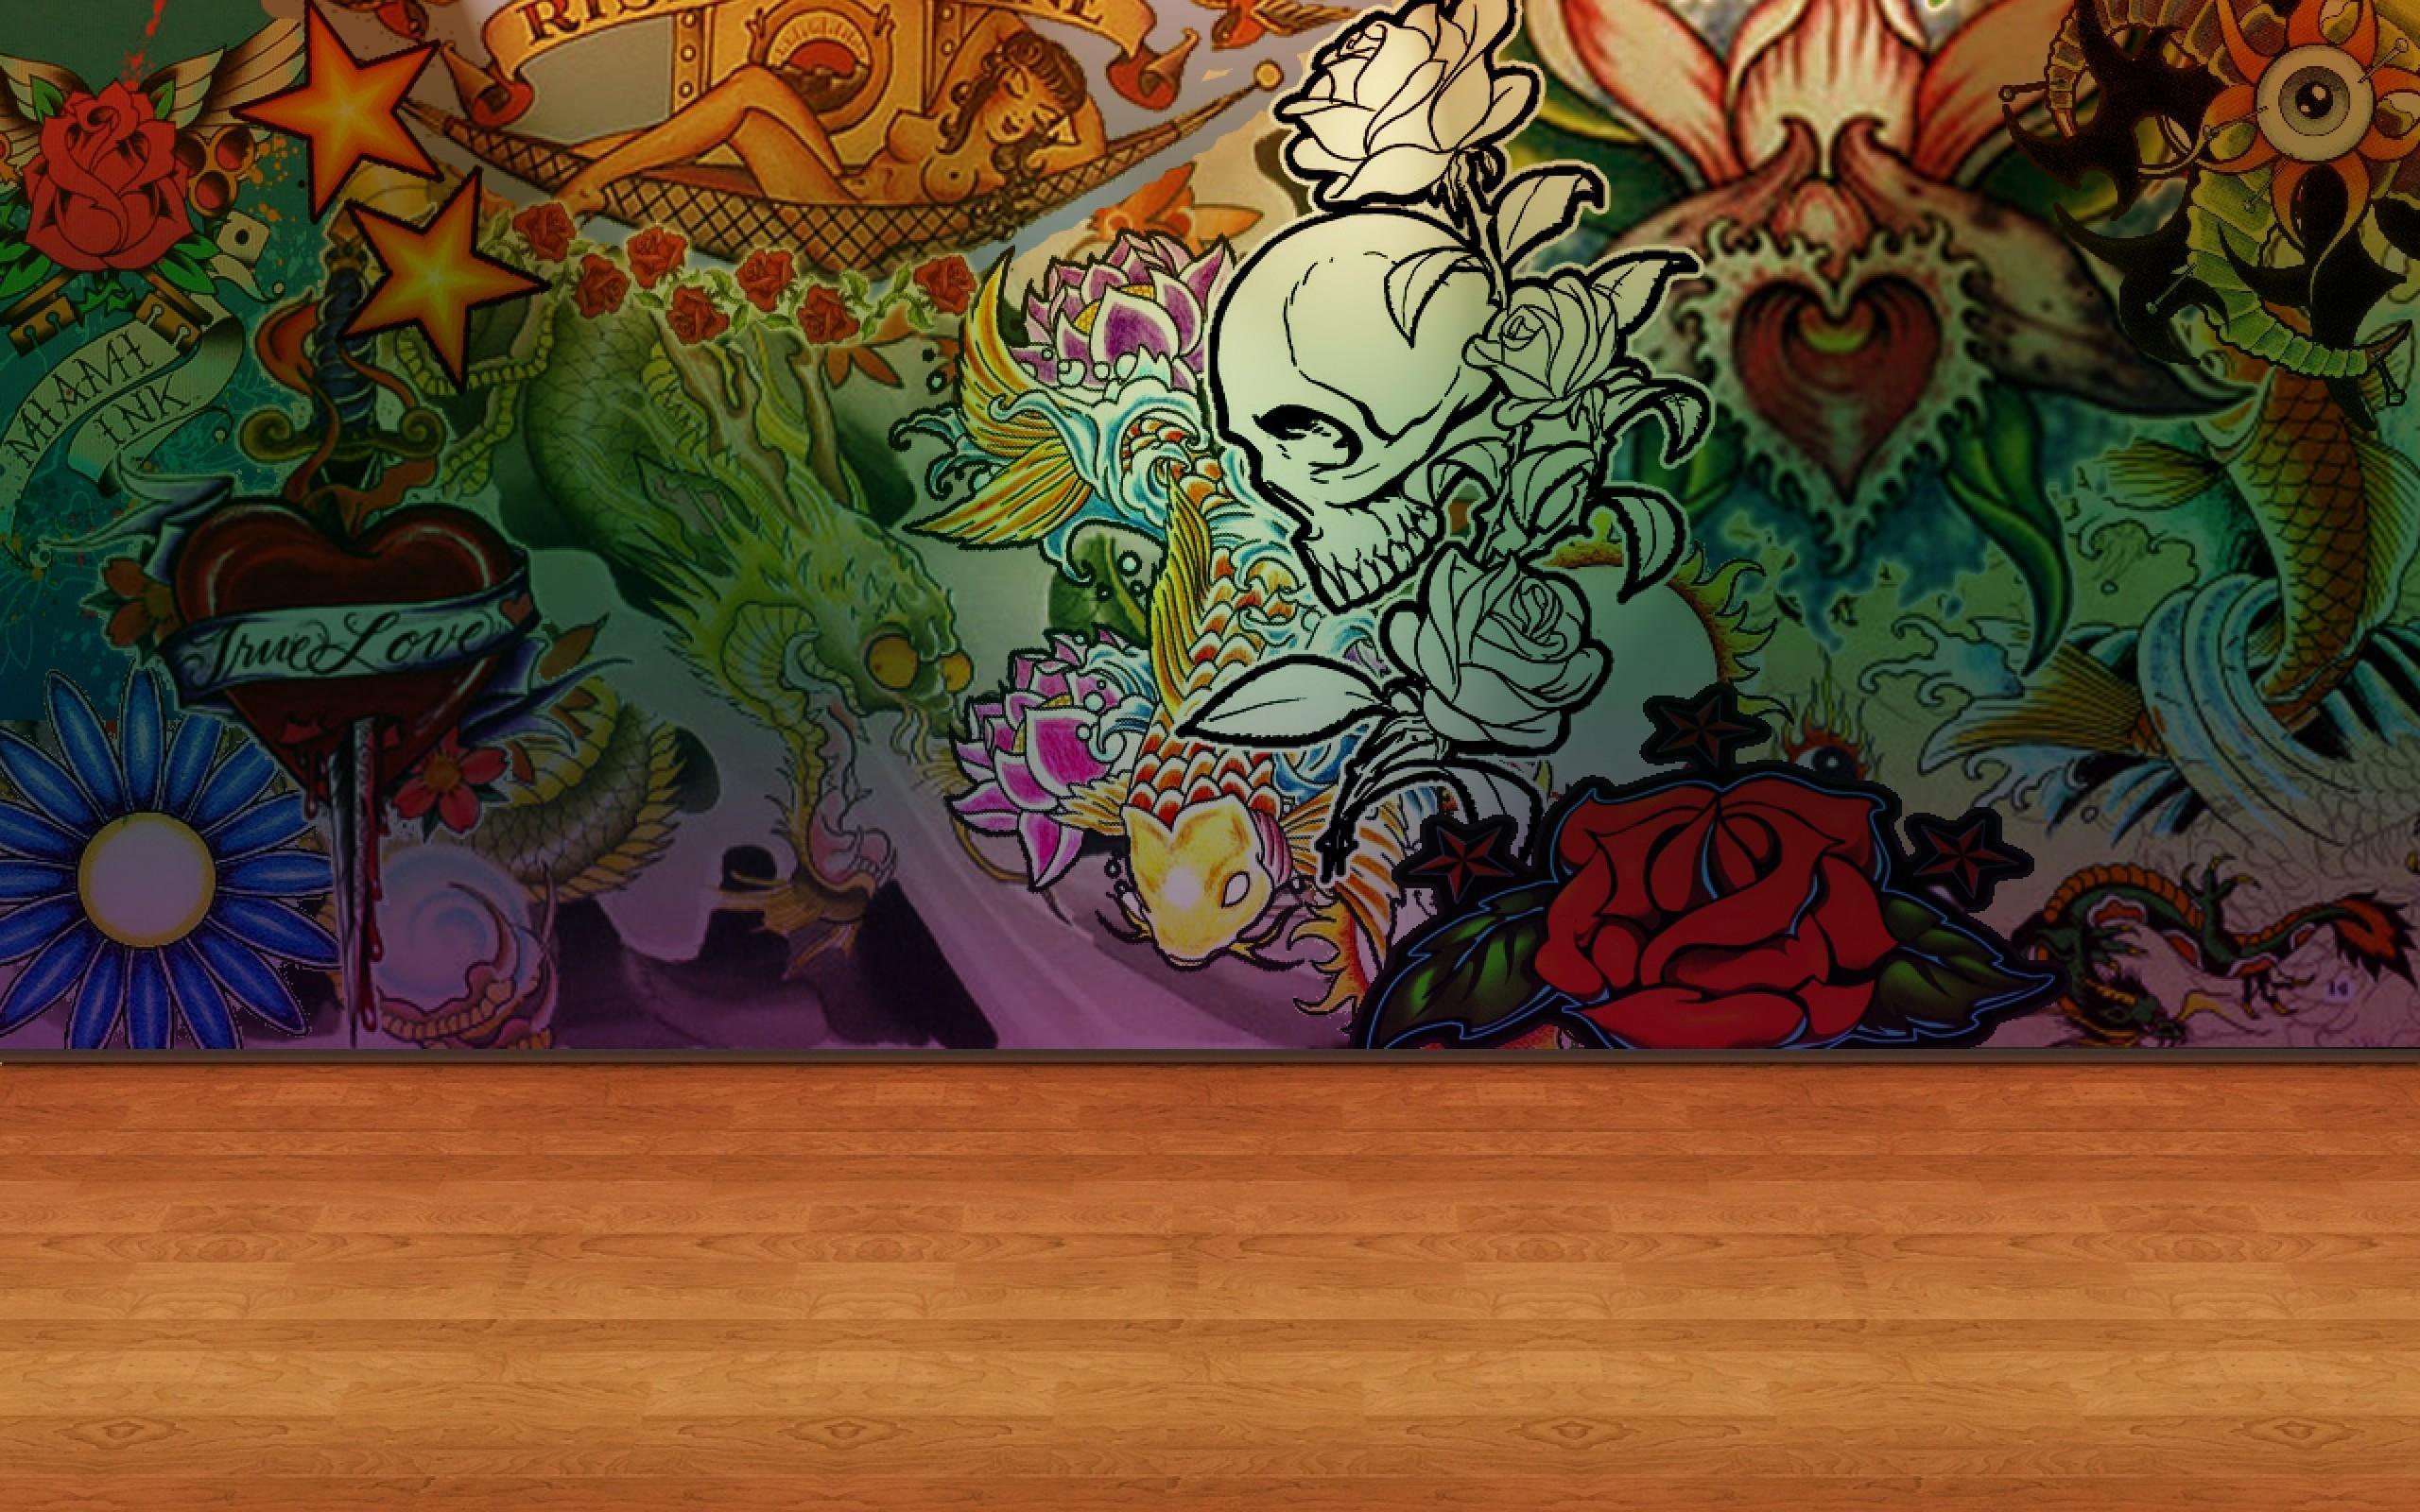 Tattoo Wall Rose Wallpaper Art For Desktop Mob #7939 Wallpaper Pertaining To Tattoo Wall Art (View 7 of 20)